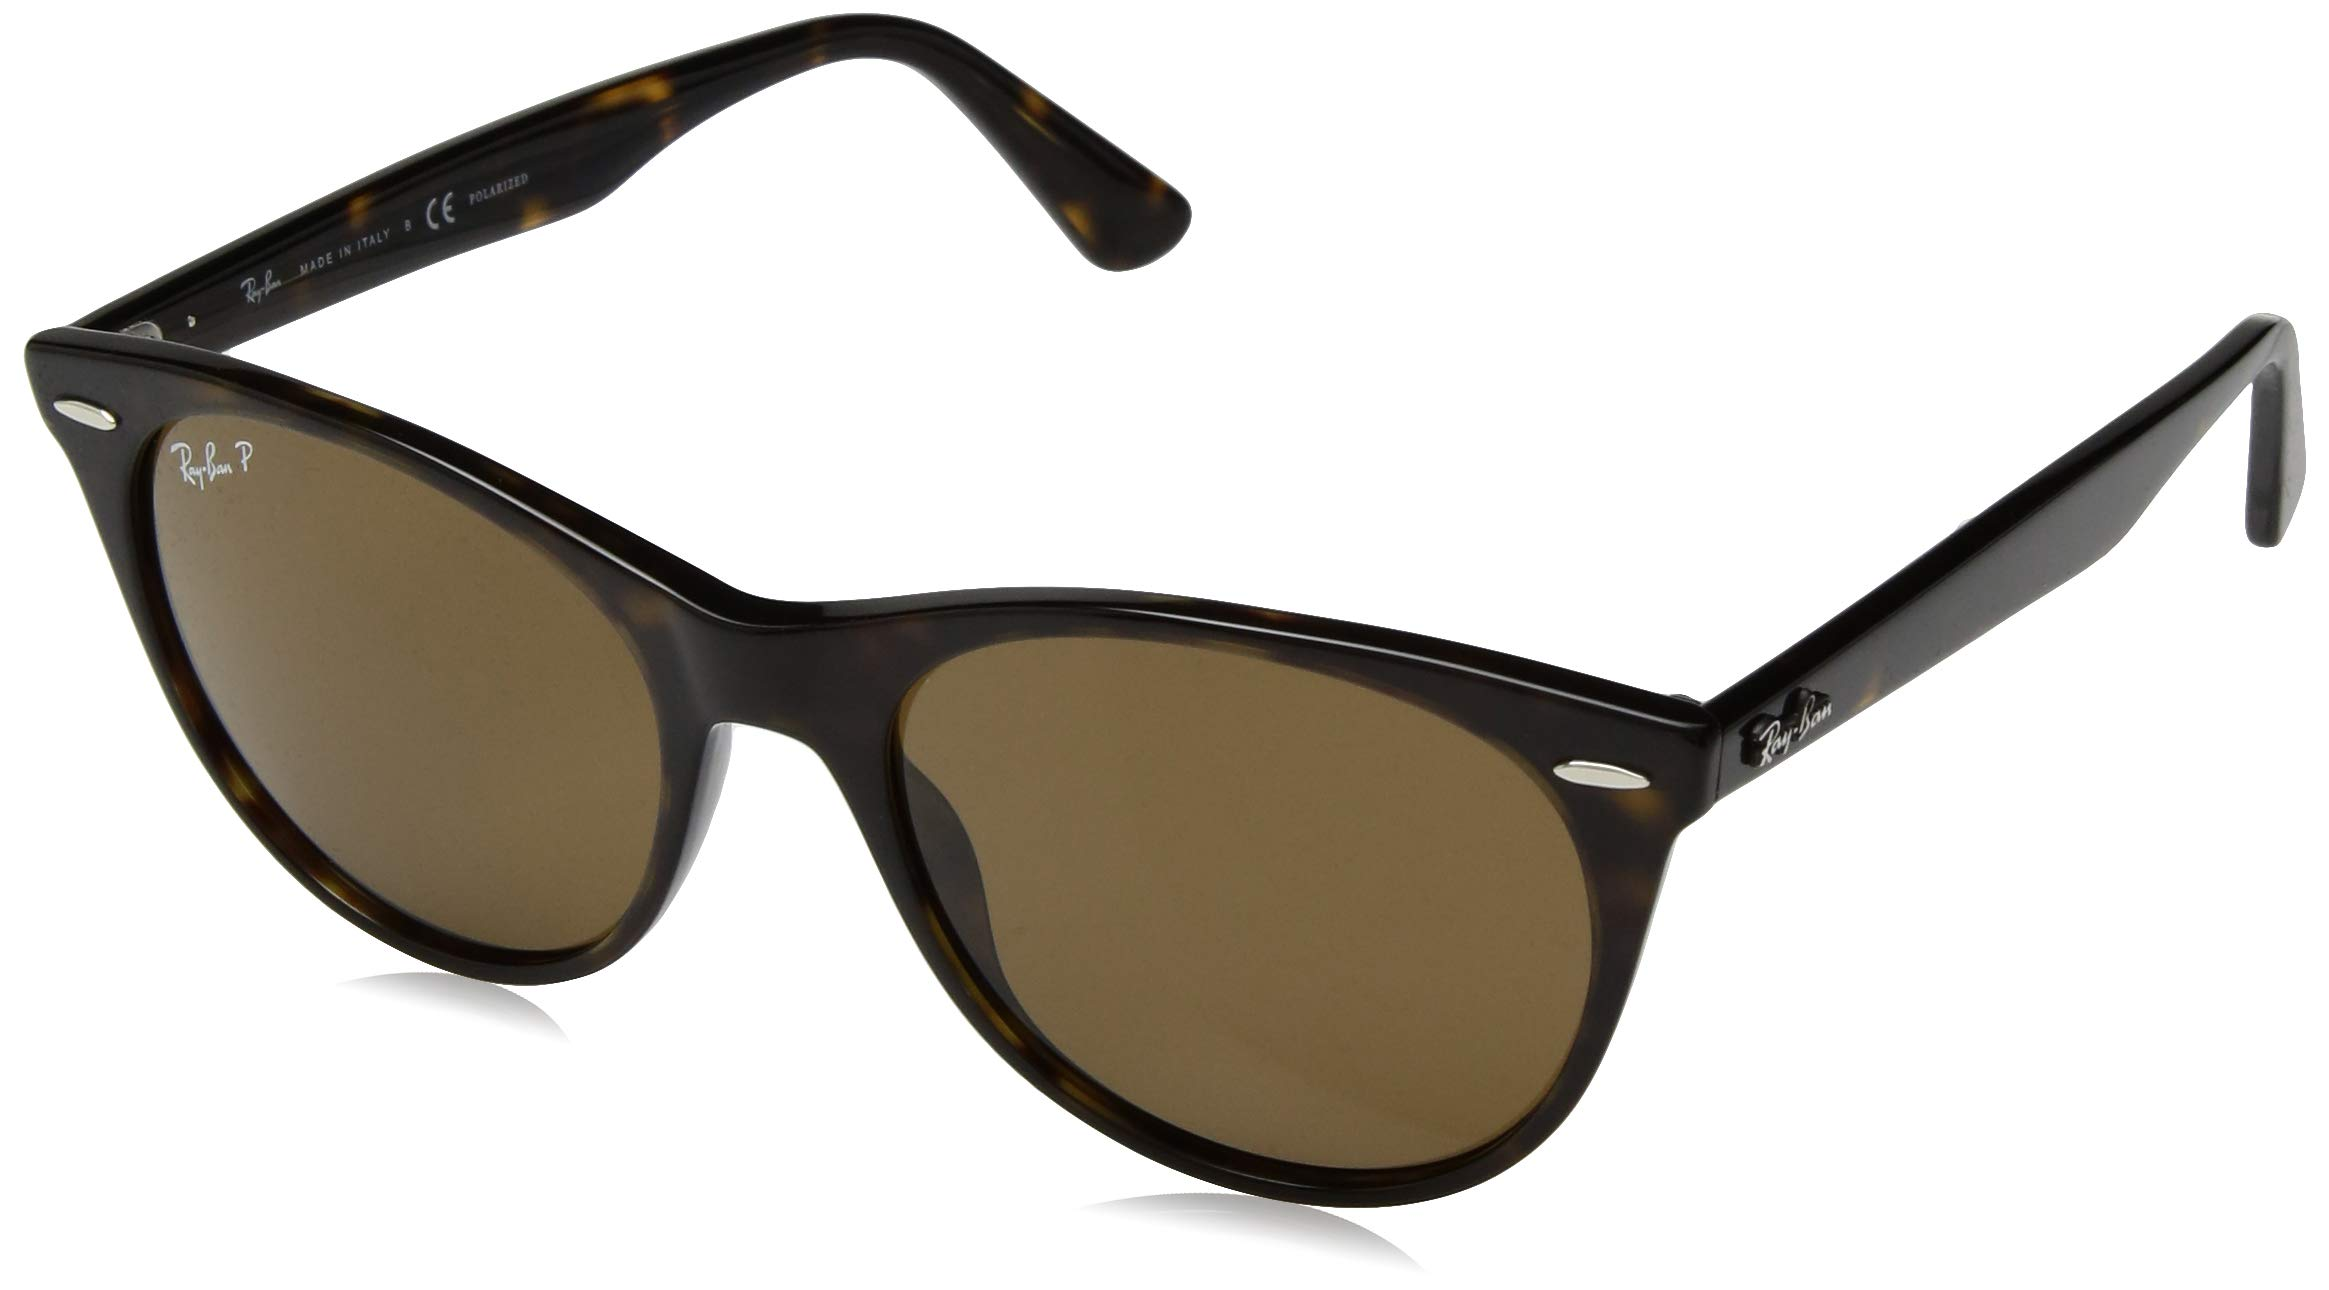 RAY-BAN RB2185 Wayfarer II Sunglasses, Striped Havana/Polarized Crystal Brown, 55 mm by RAY-BAN